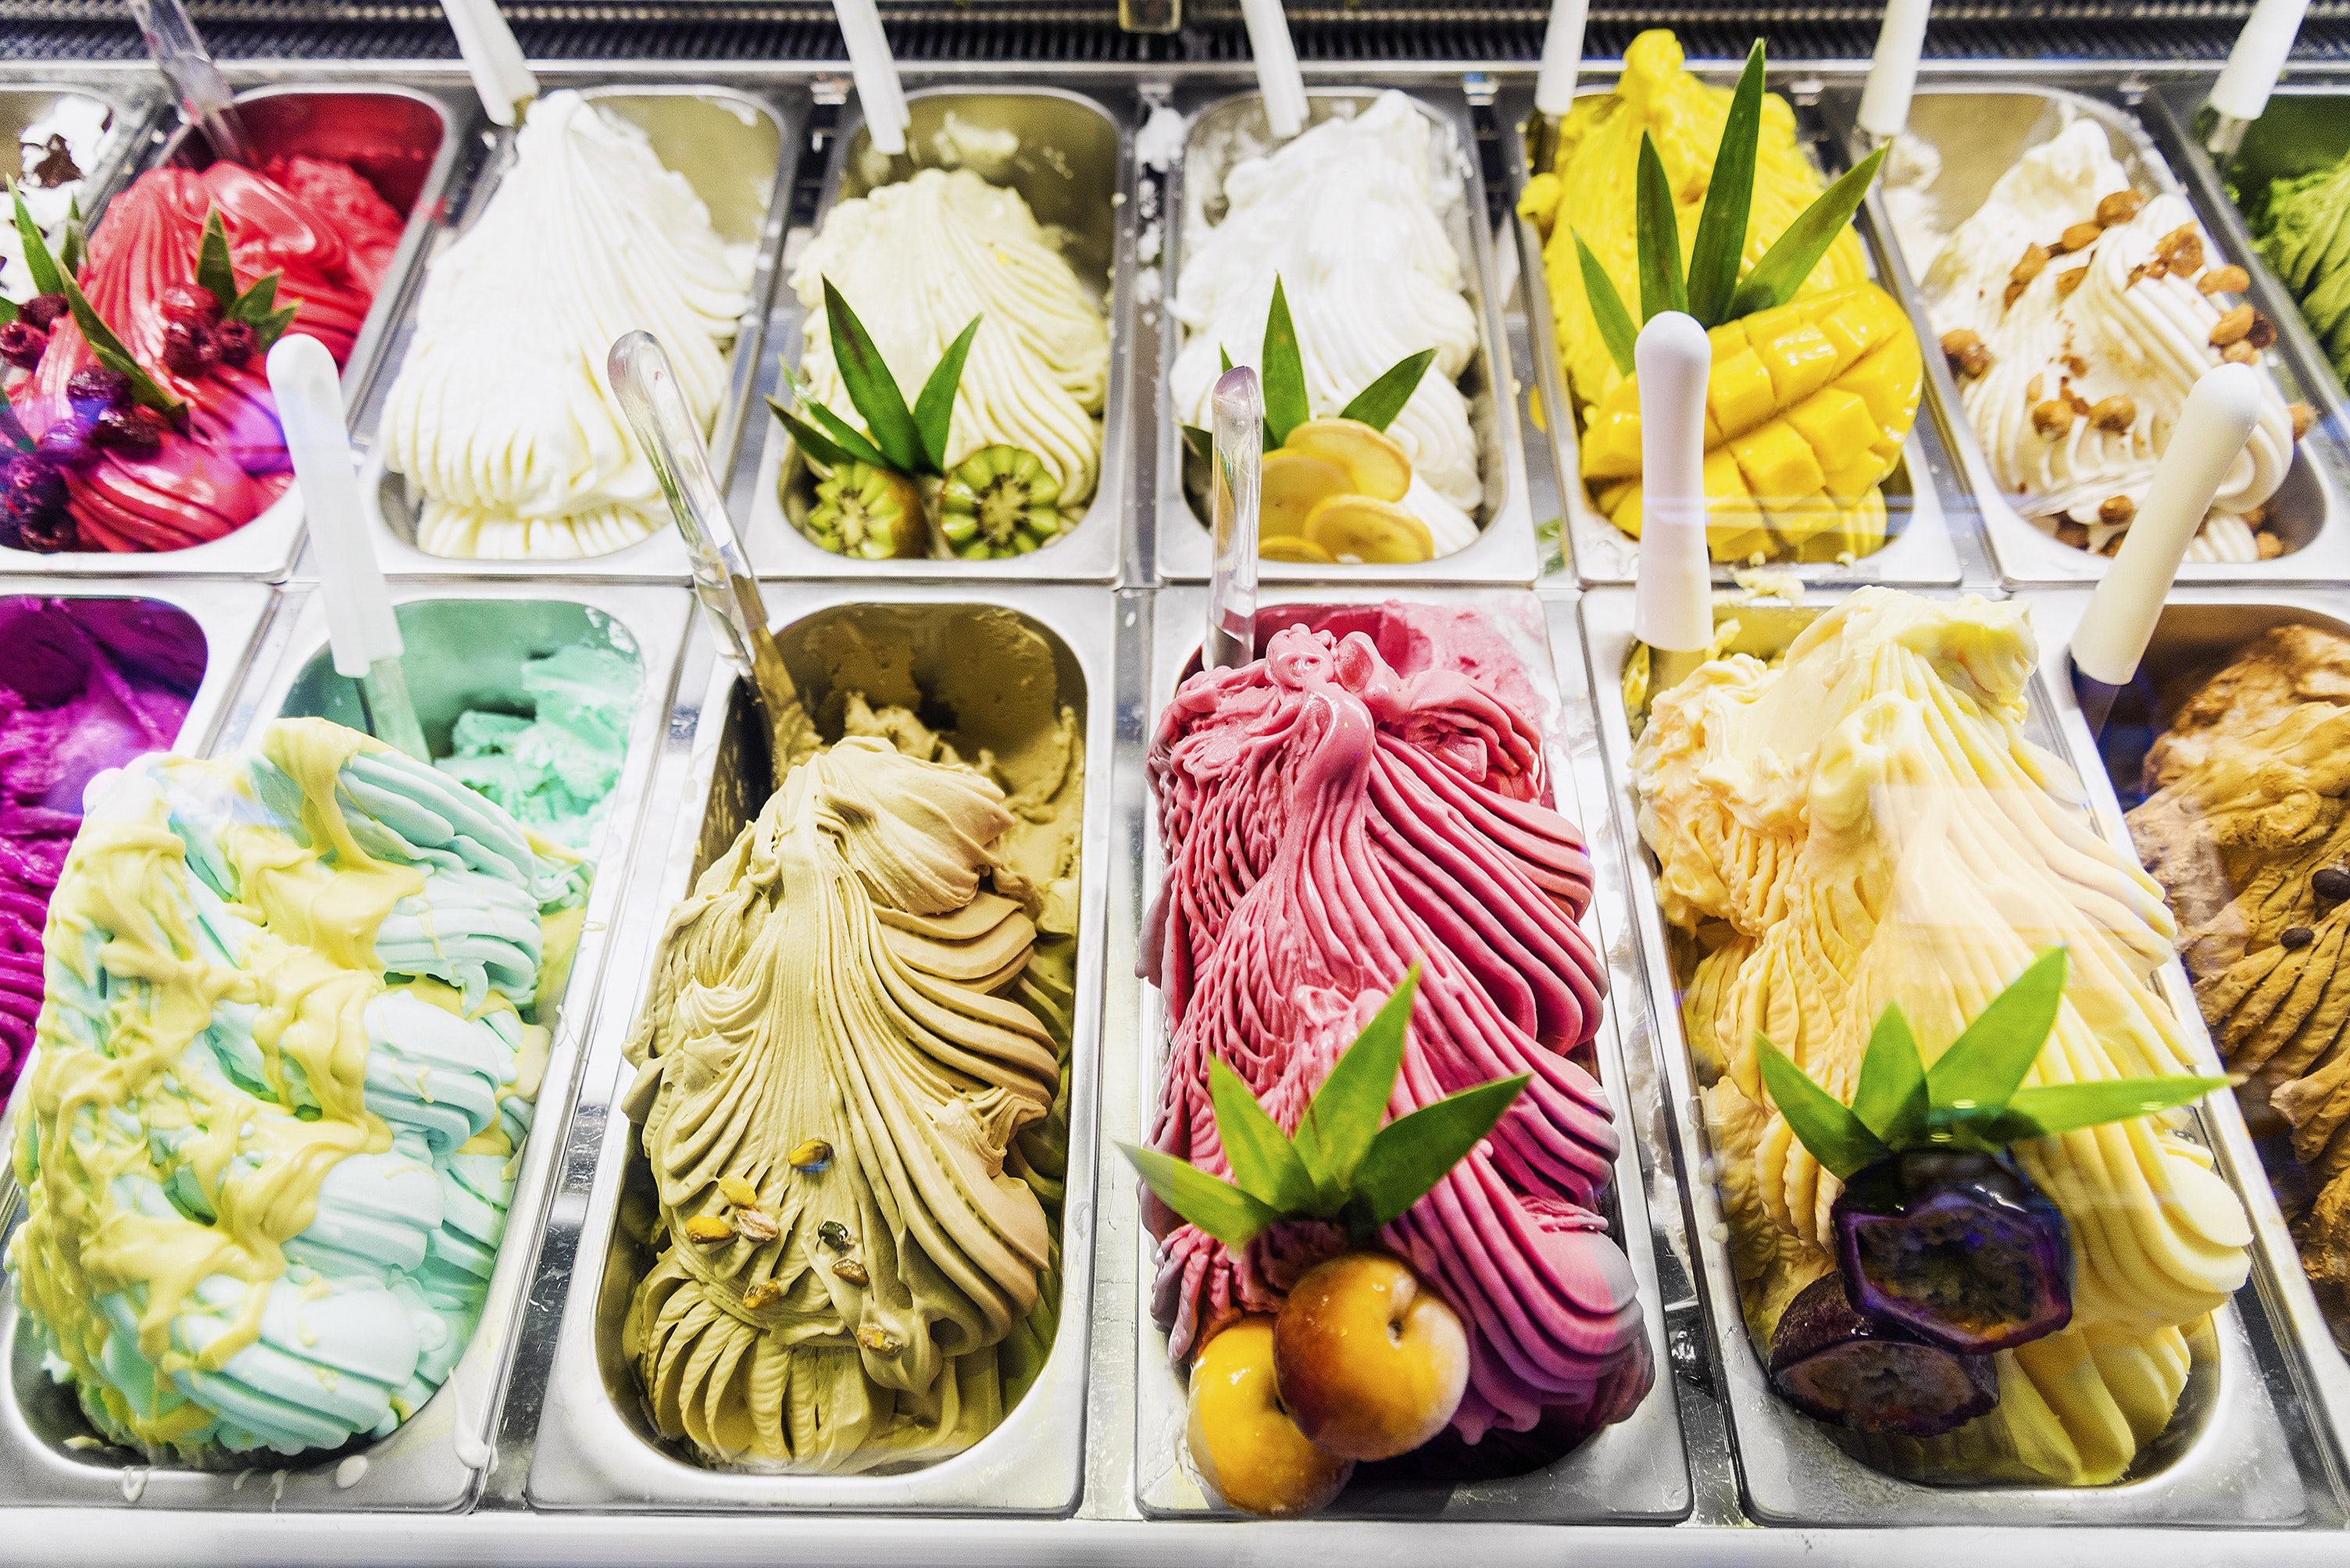 Enjoy a refreshing gelato in Florence